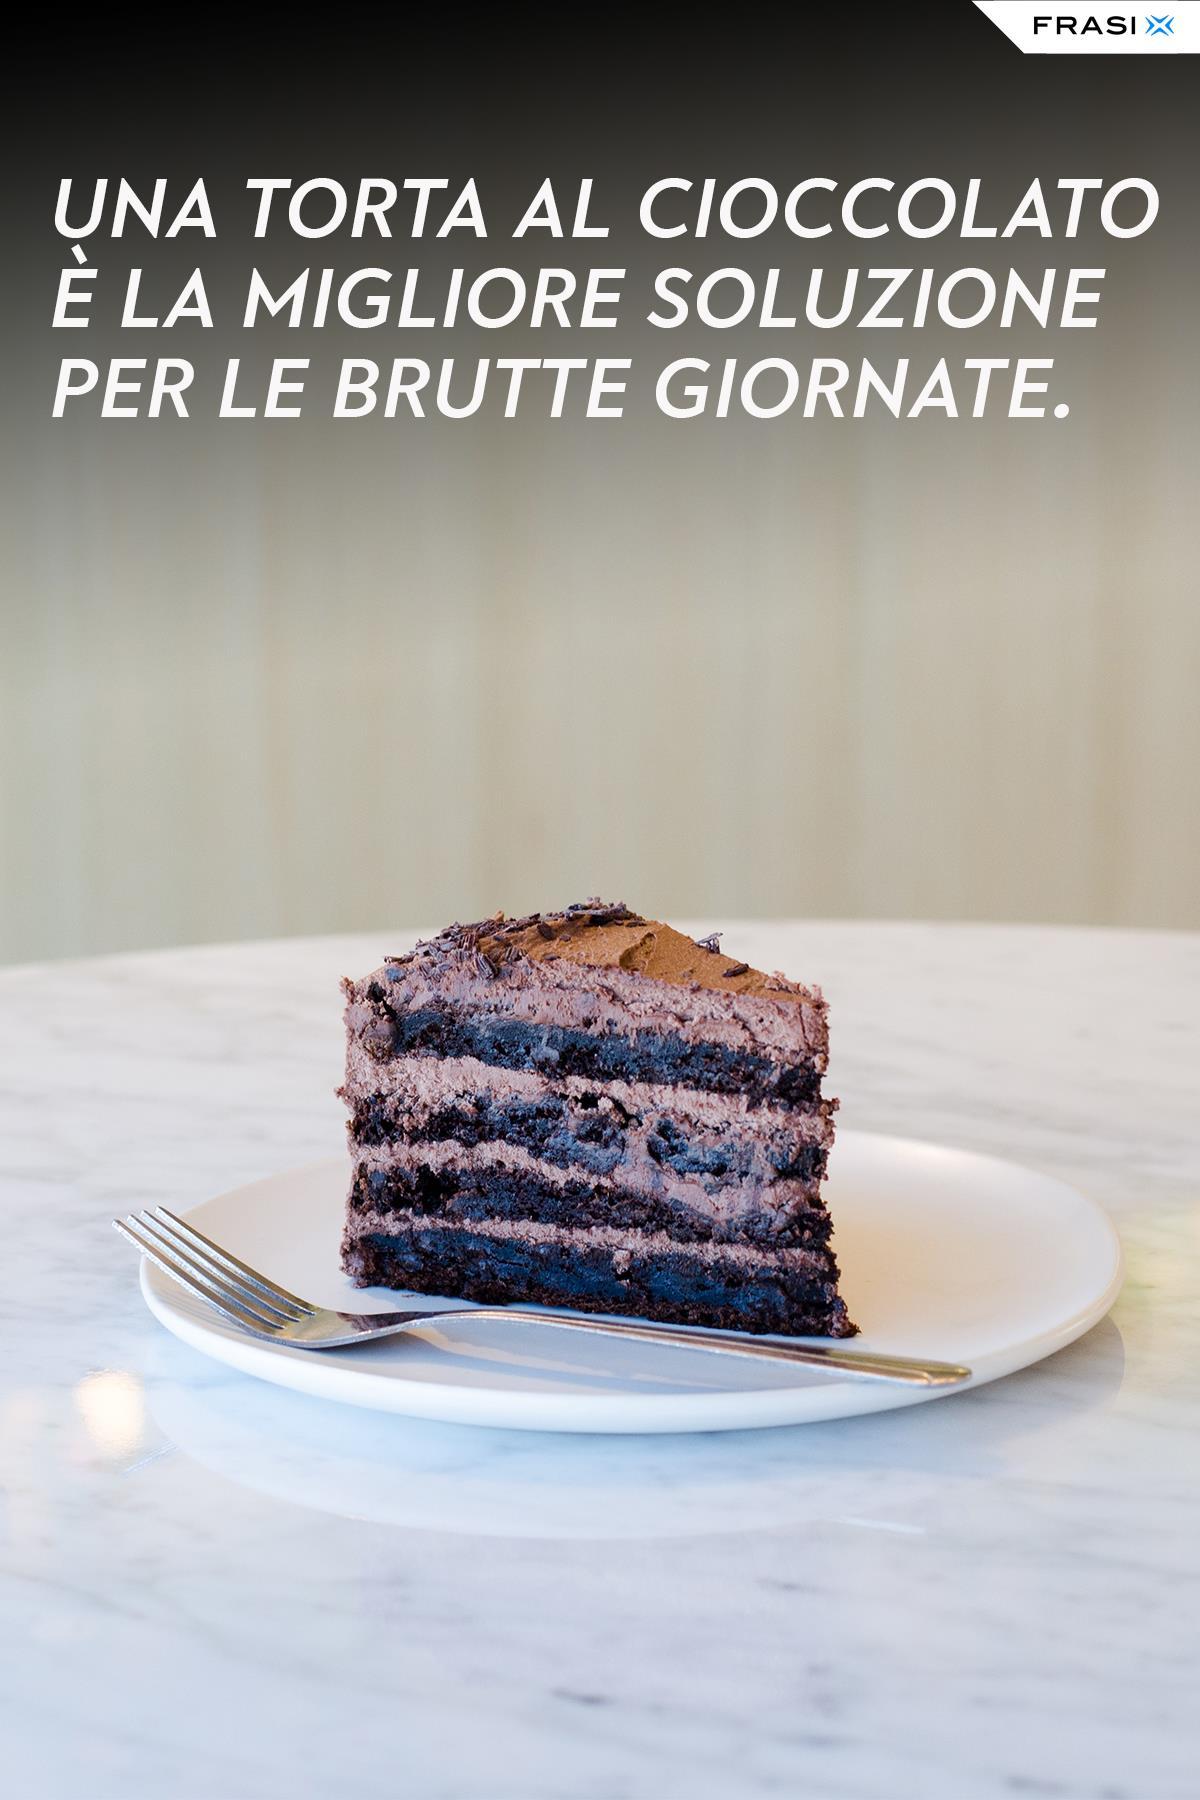 Frasi torta al cioccolato